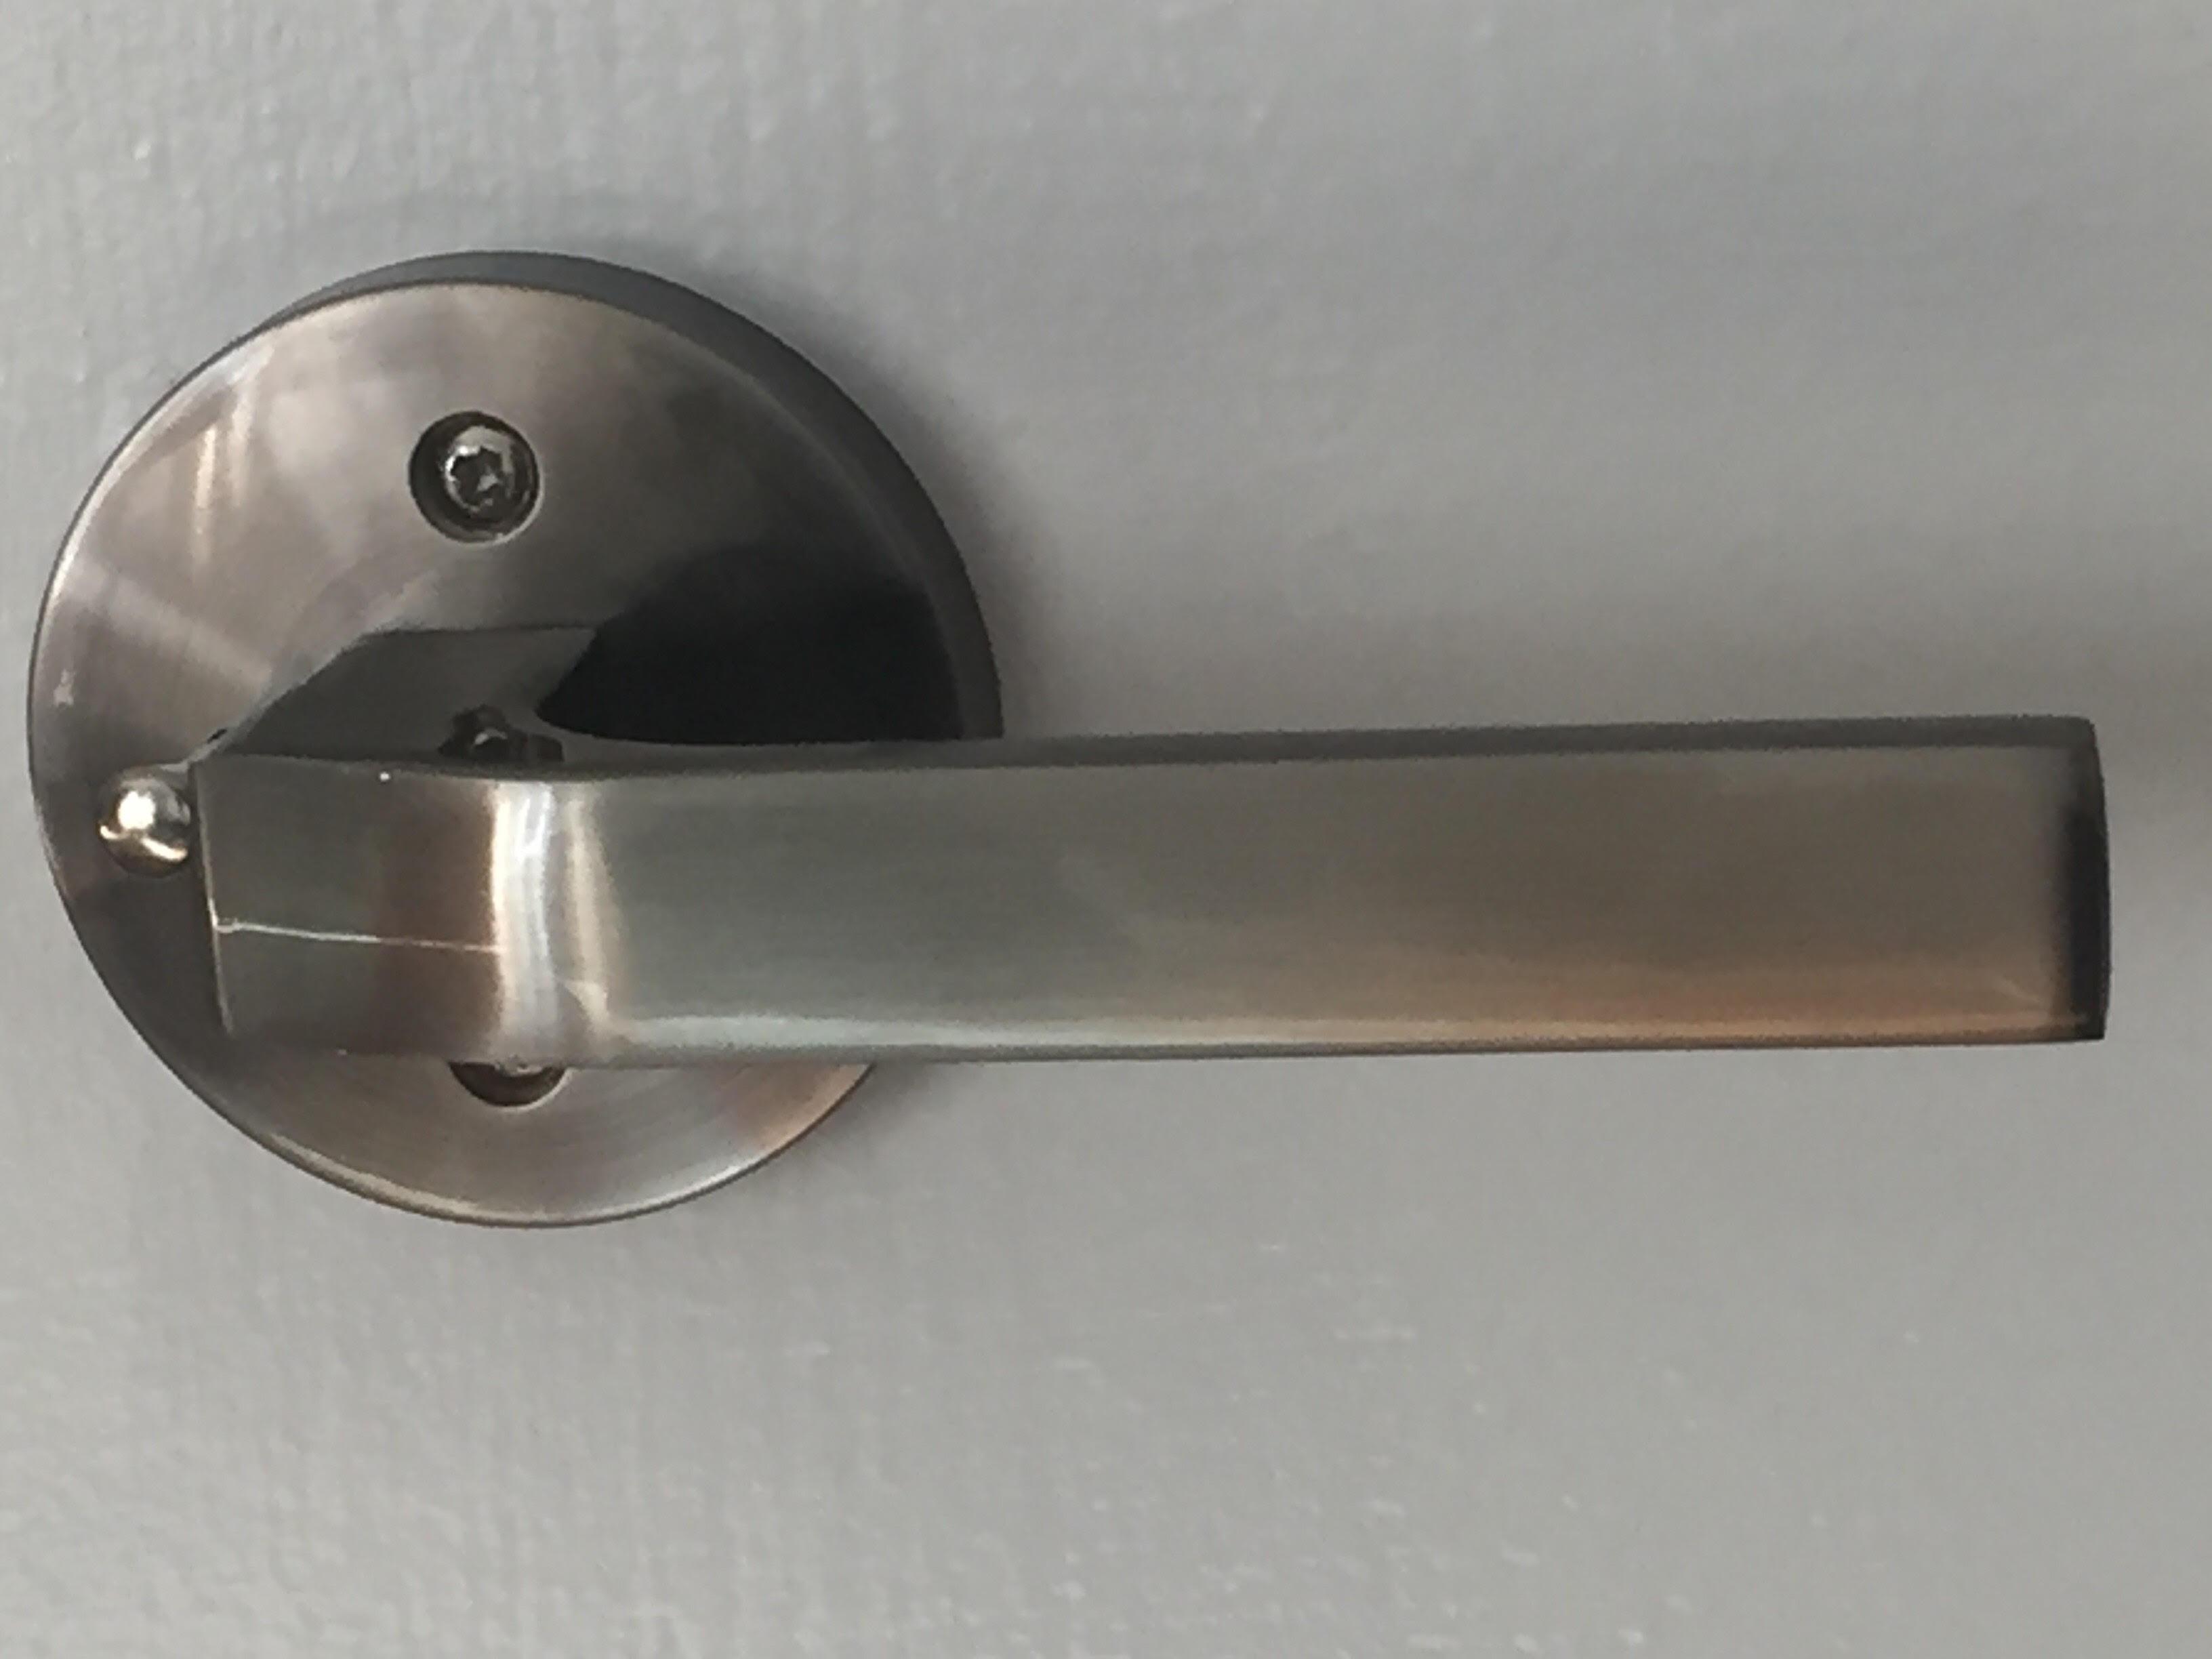 Modern interior door handle set round rose push button - Contemporary interior door levers ...